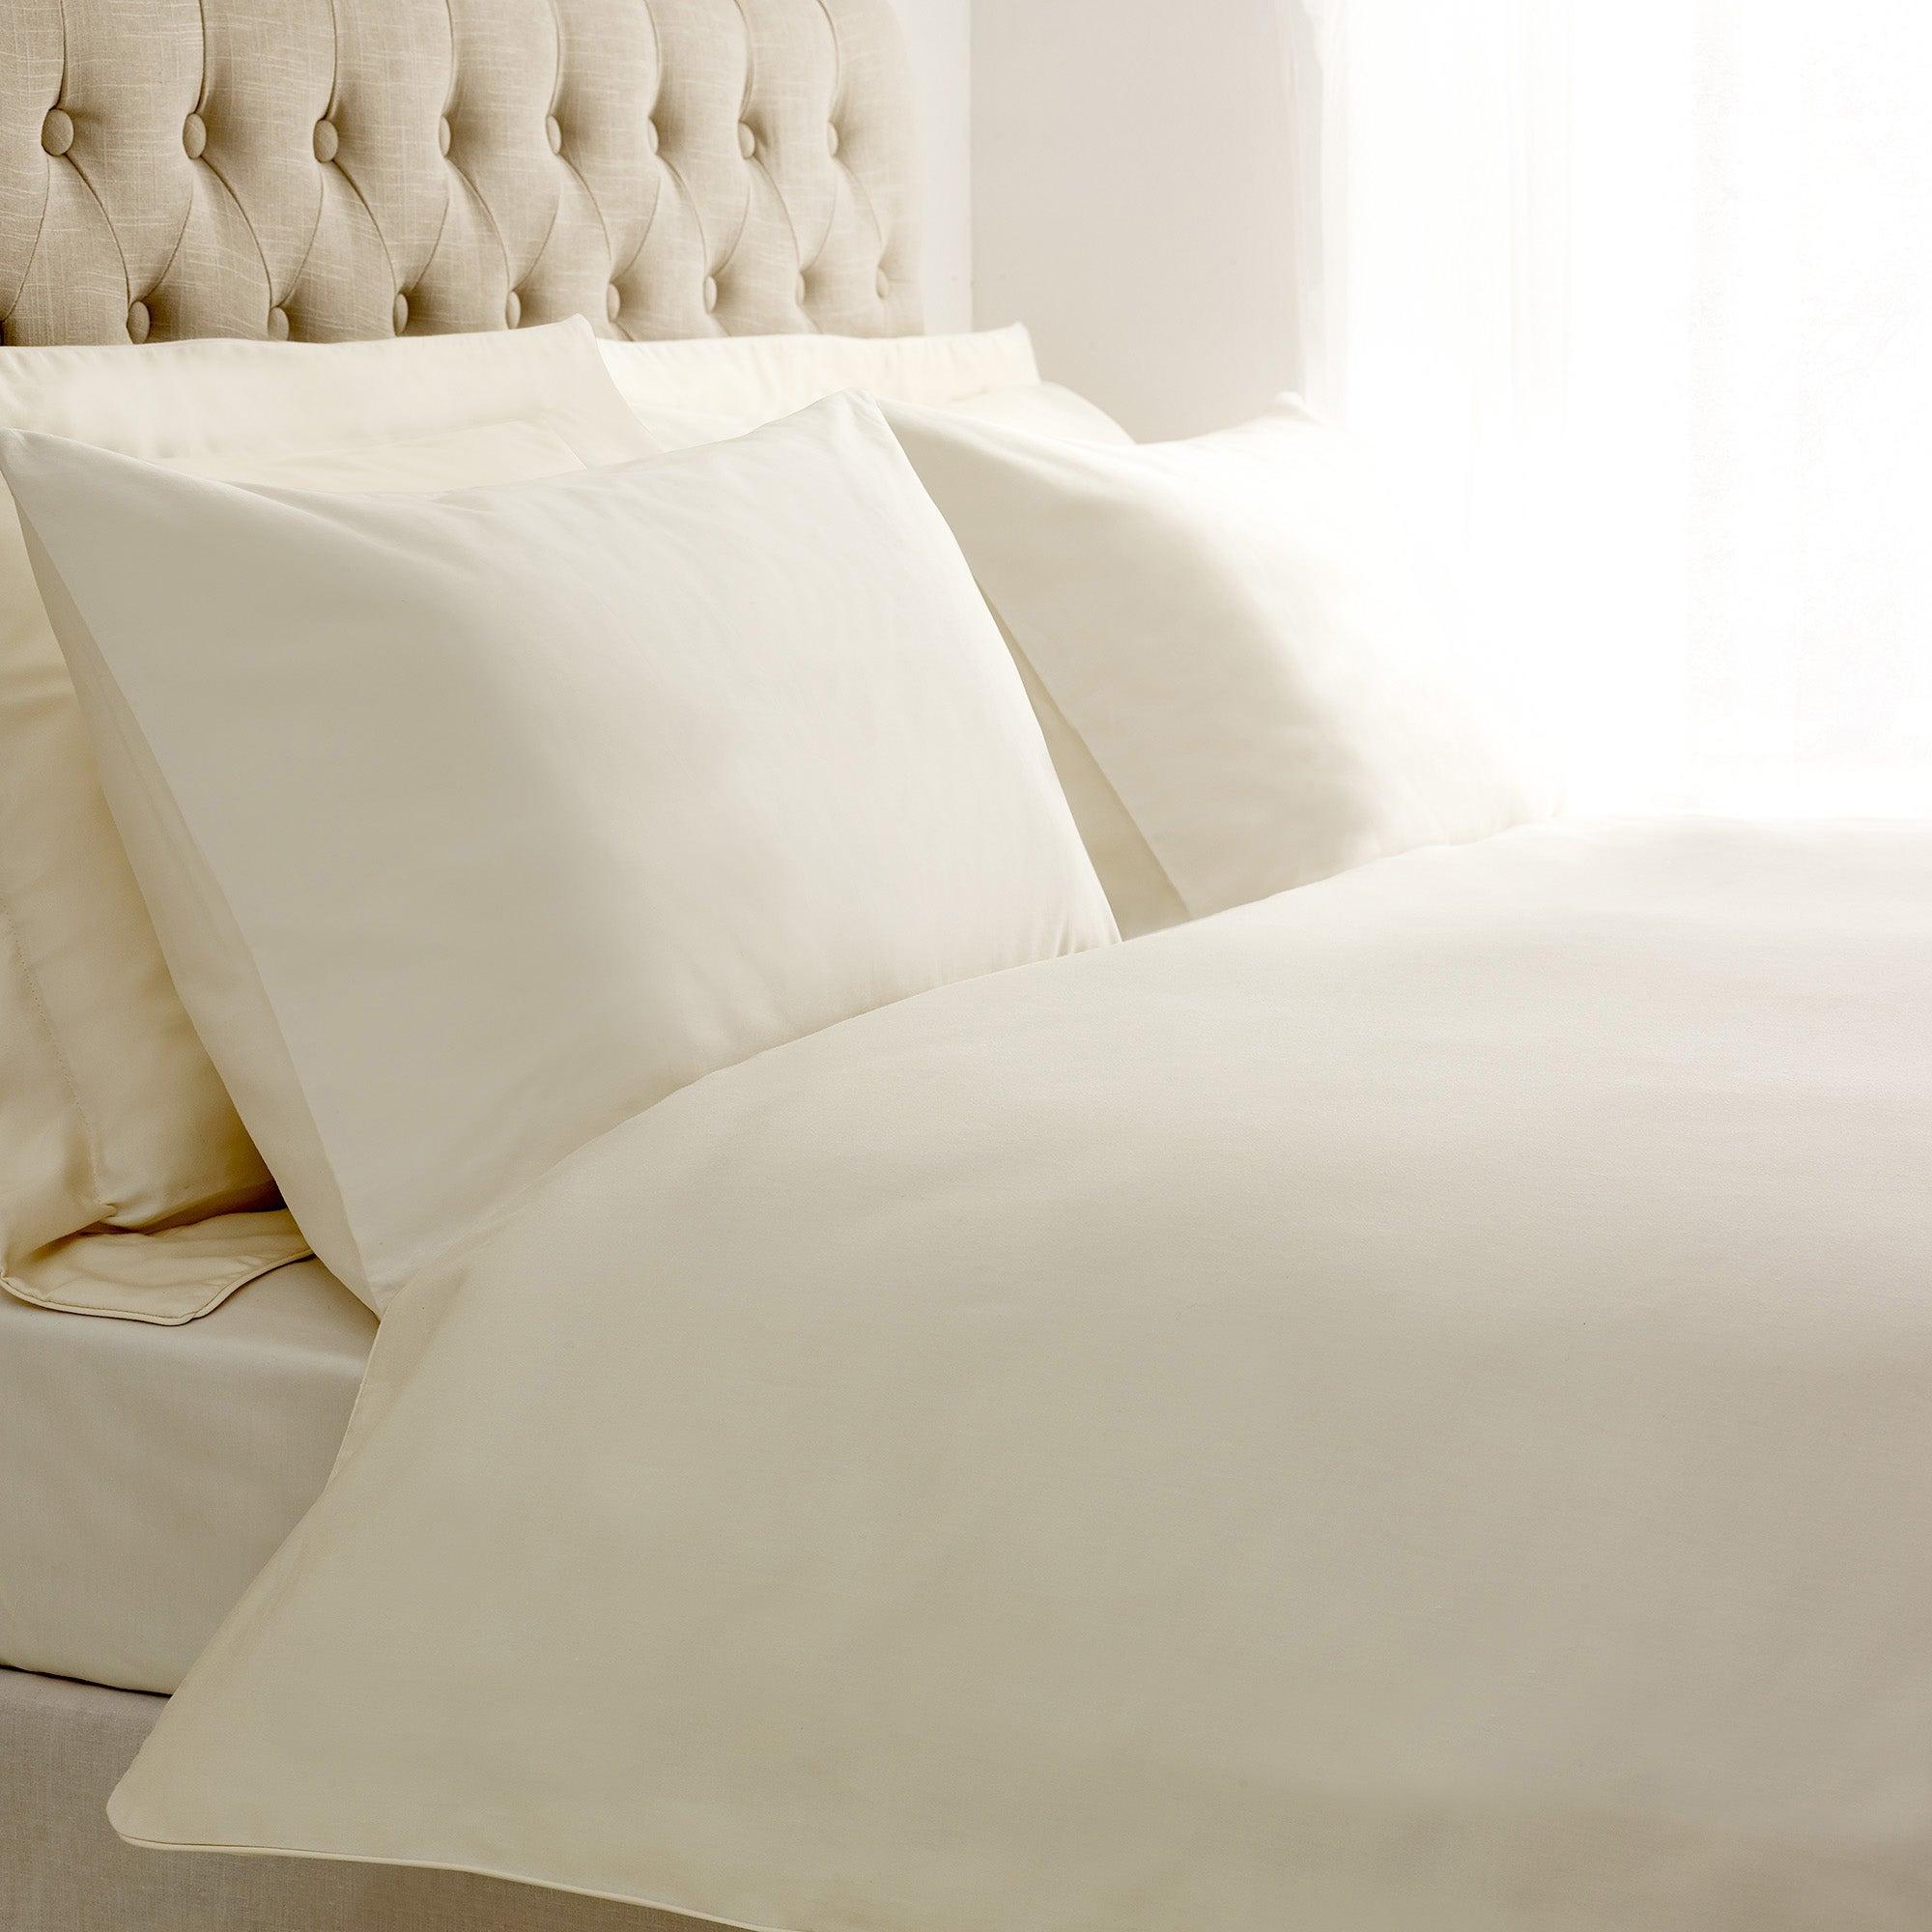 Image of 5A Fifth Avenue 400 Thread Count 100% Cotton Plain Cream Piped Duvet Cover Cream